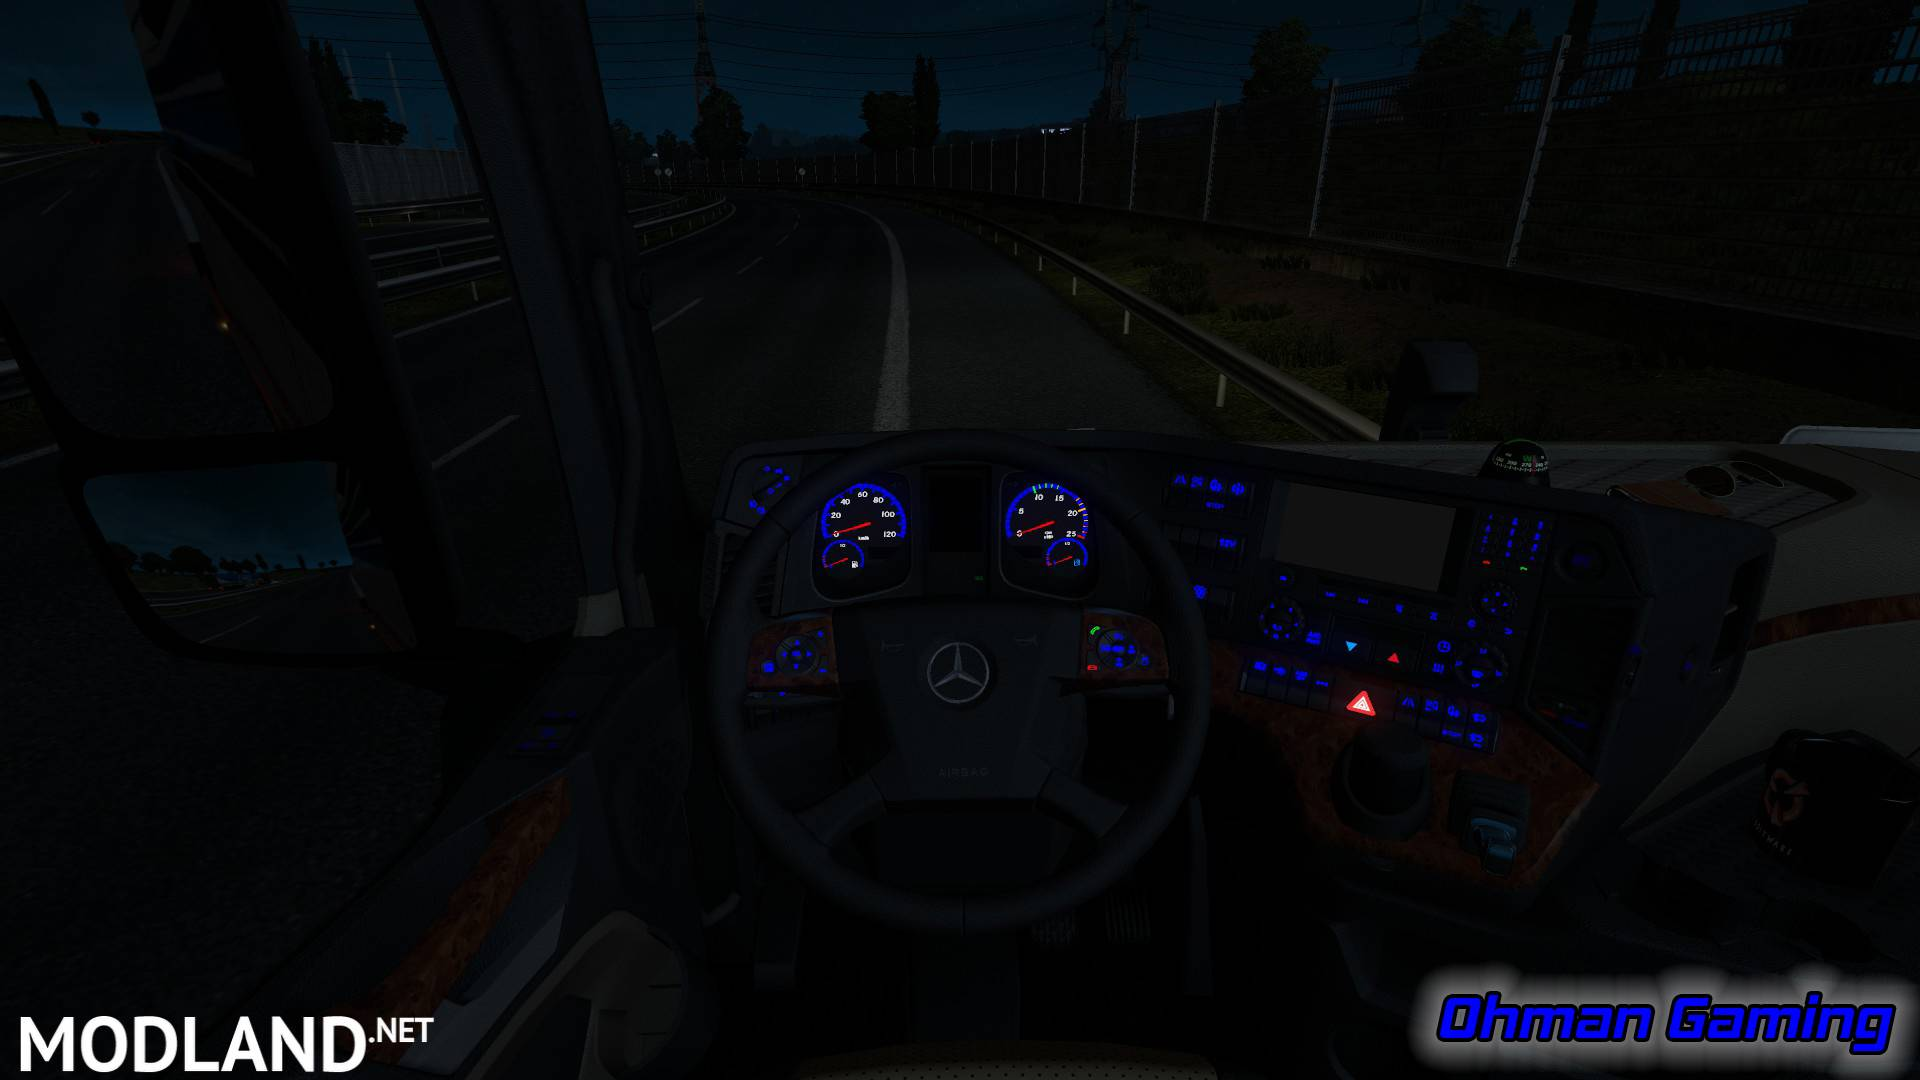 Mercedes benz mp4 blue dashboard lights mod for ets 2 for Mercedes benz dashboard lights not working